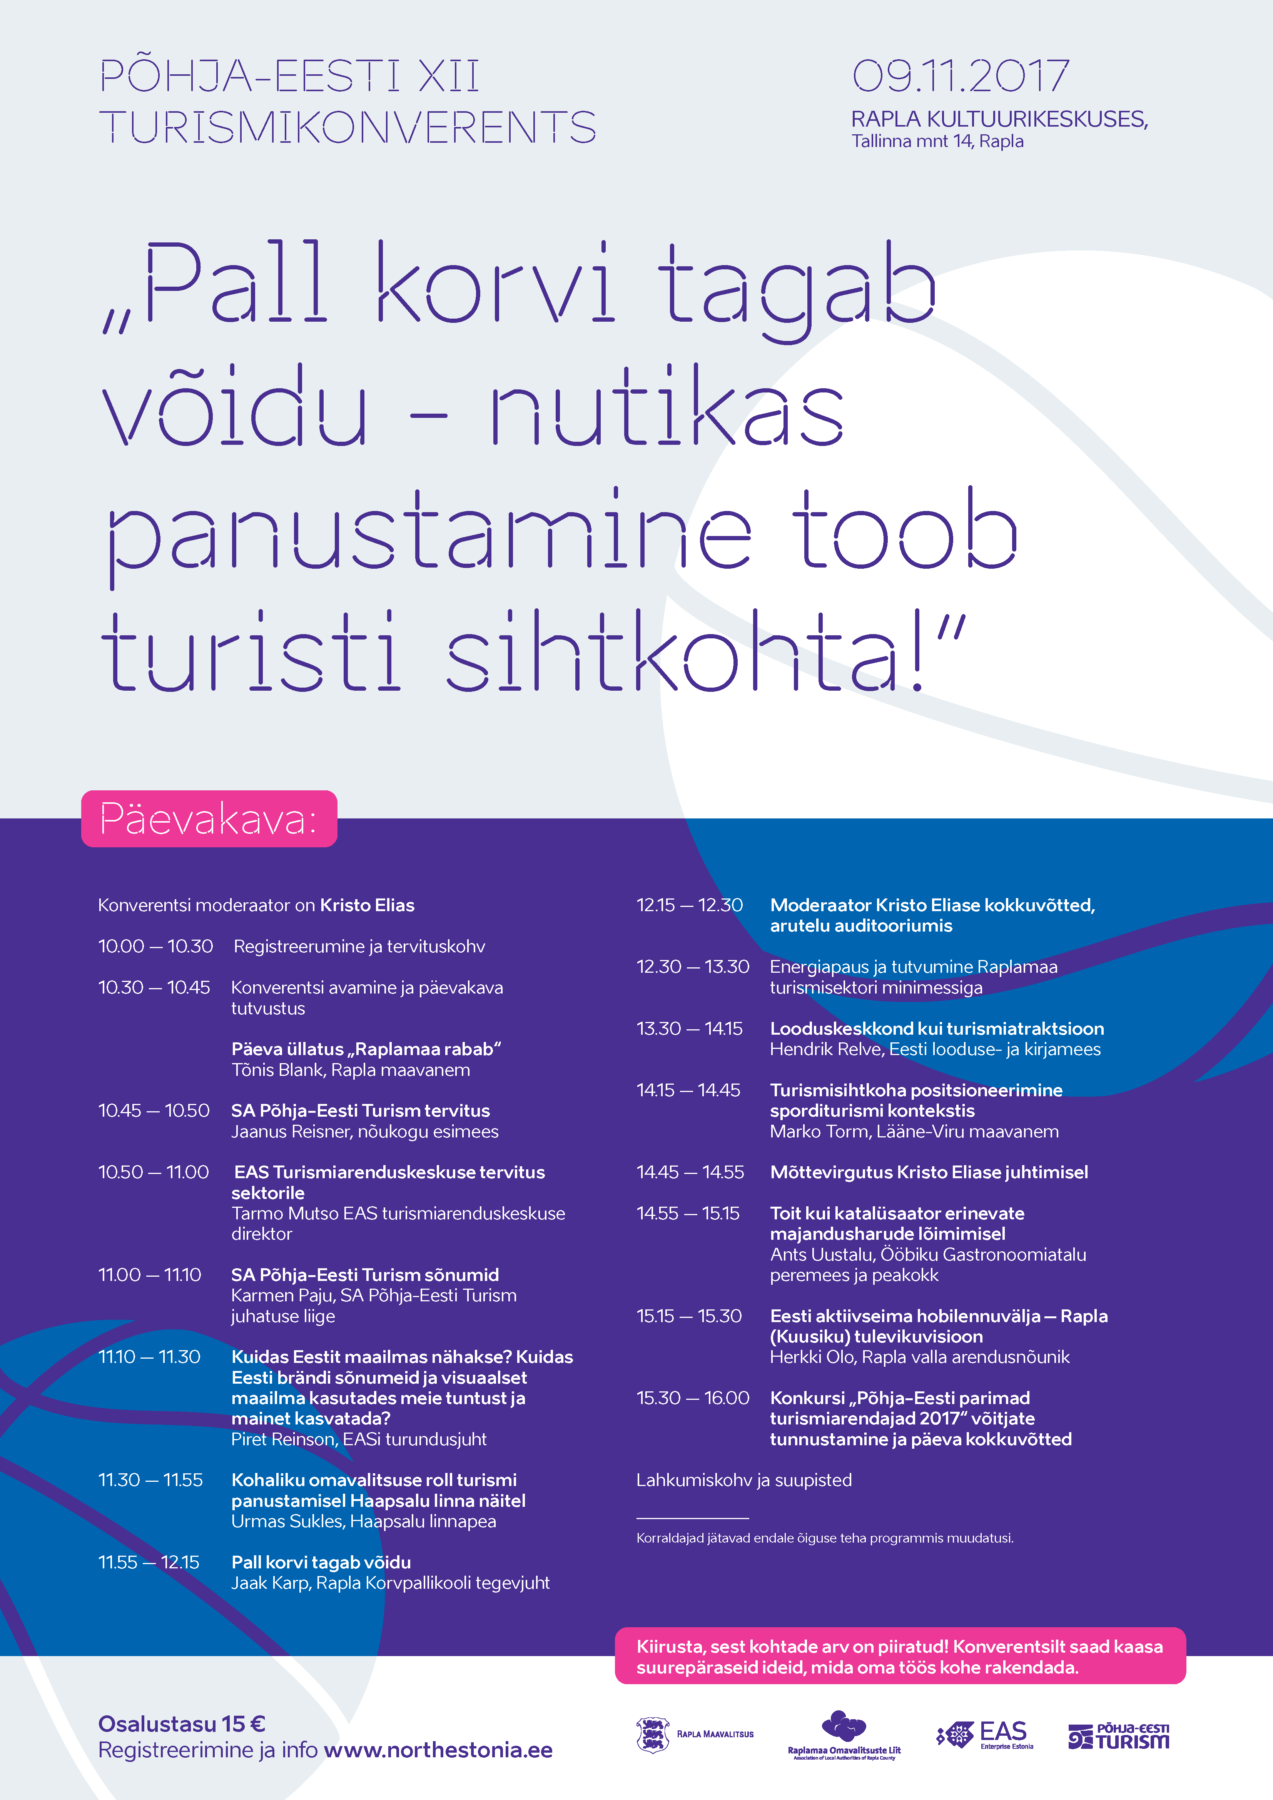 Conference poster design